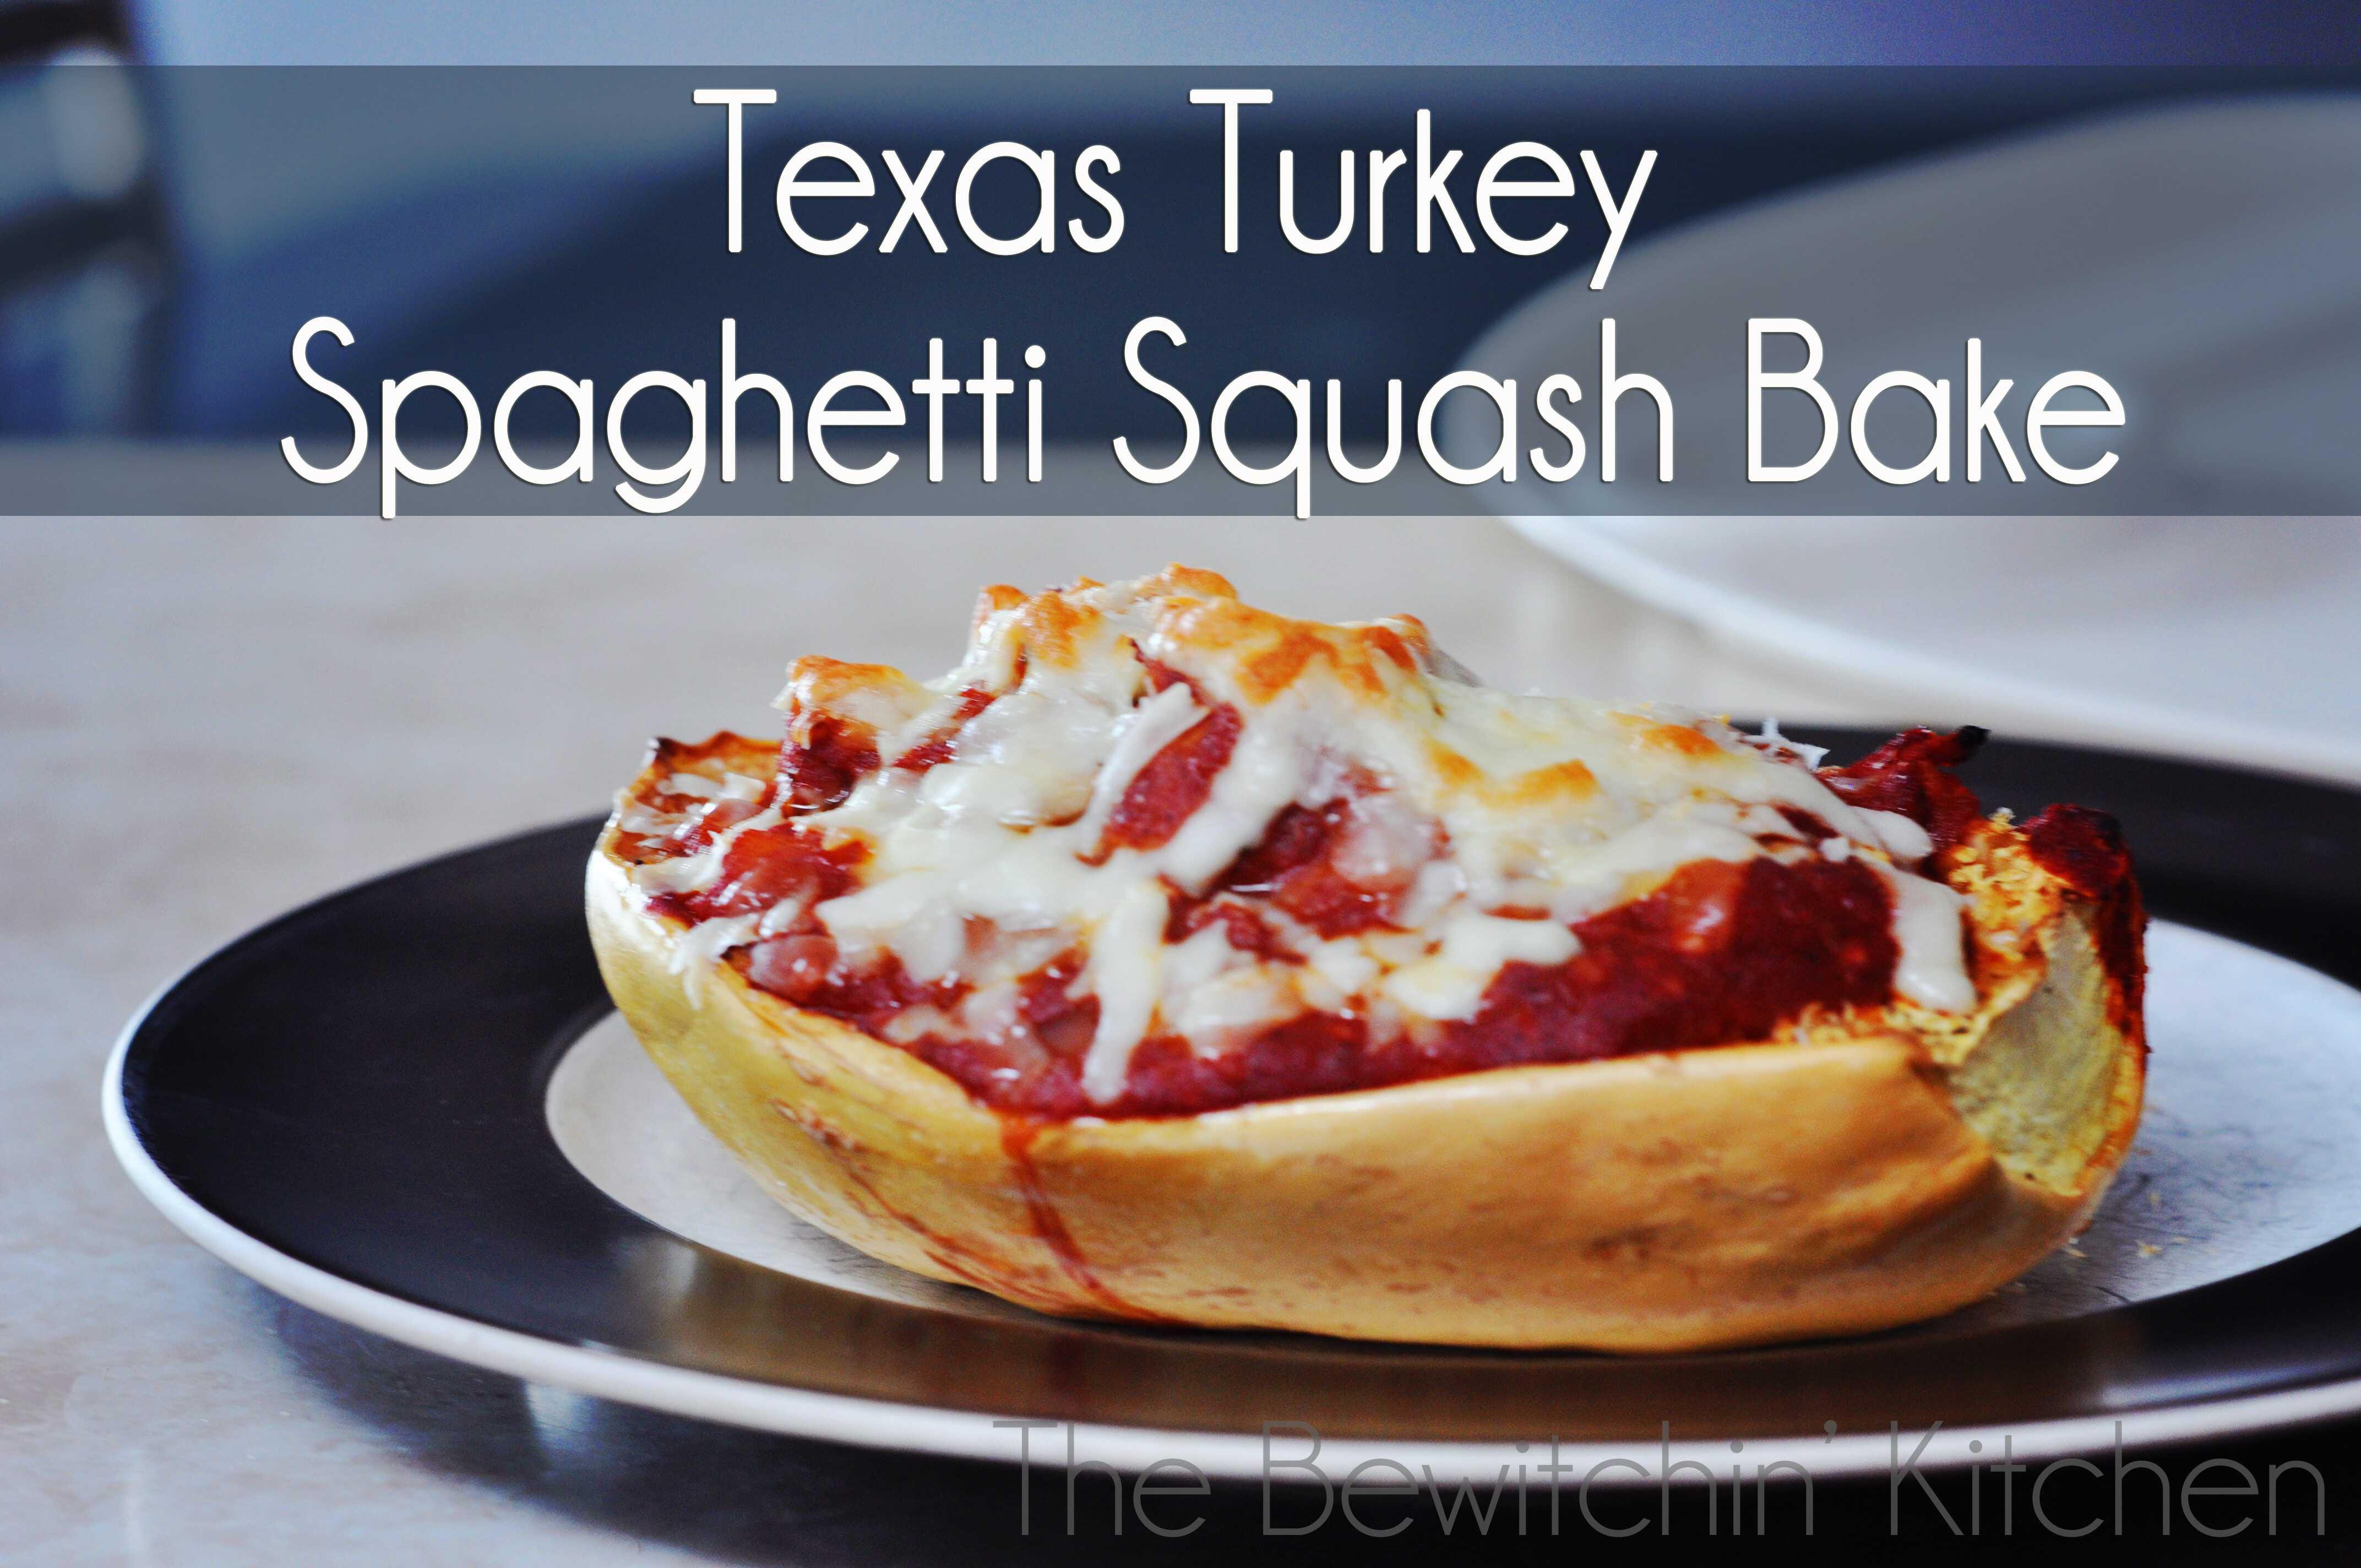 Texas Turkey Spaghetti Squash Bake: A gluten free and paleo recipe ...